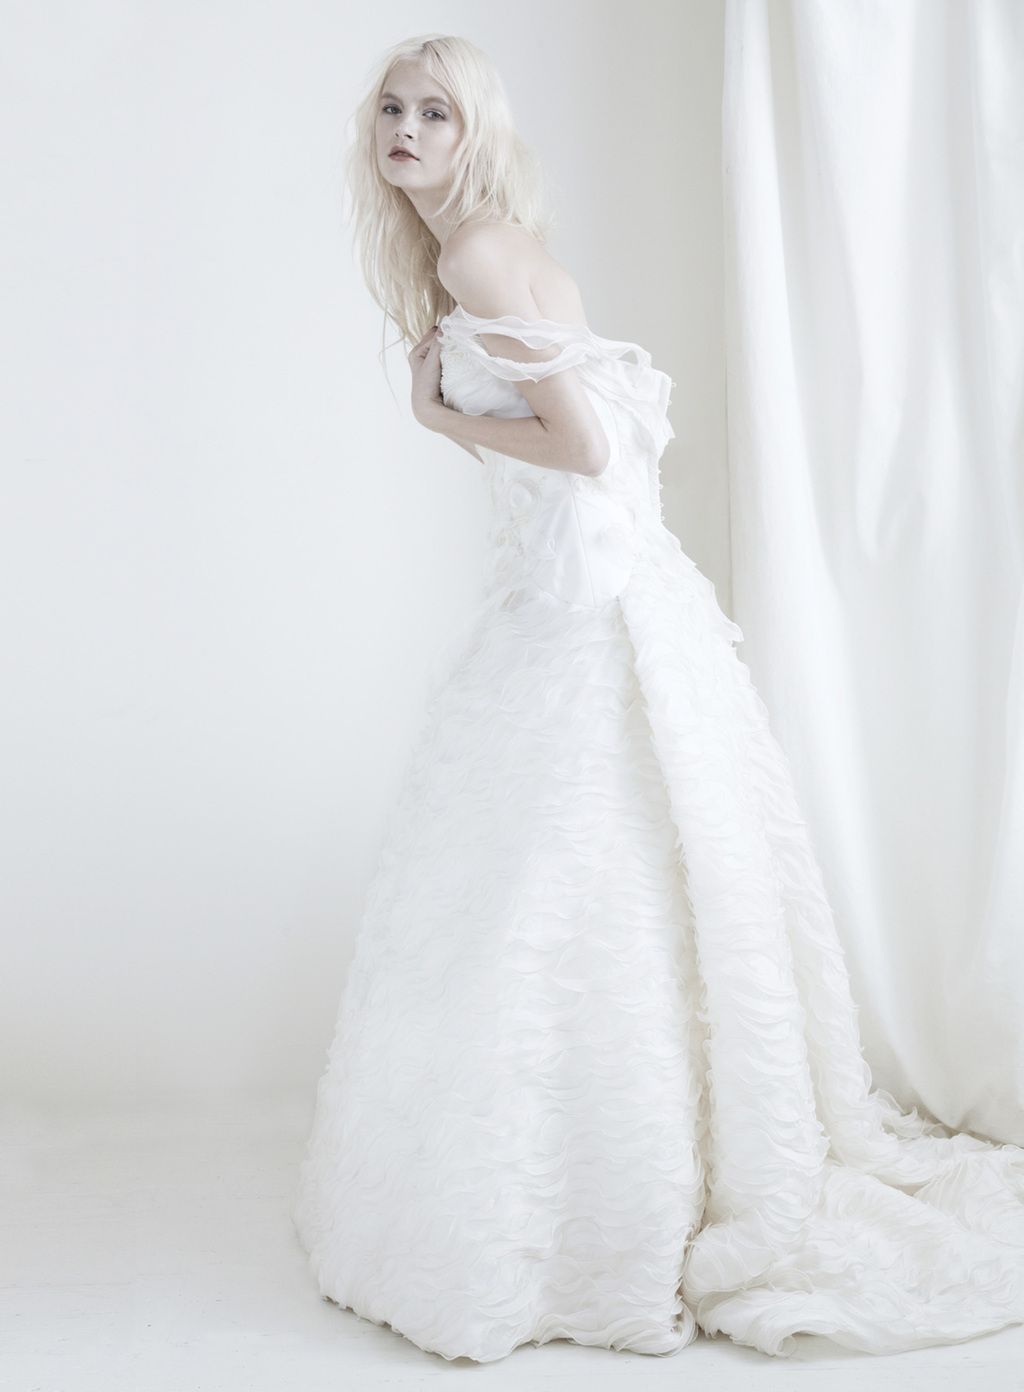 Mariana-hardwick-wedding-dress-2013-bridal-amiel.full